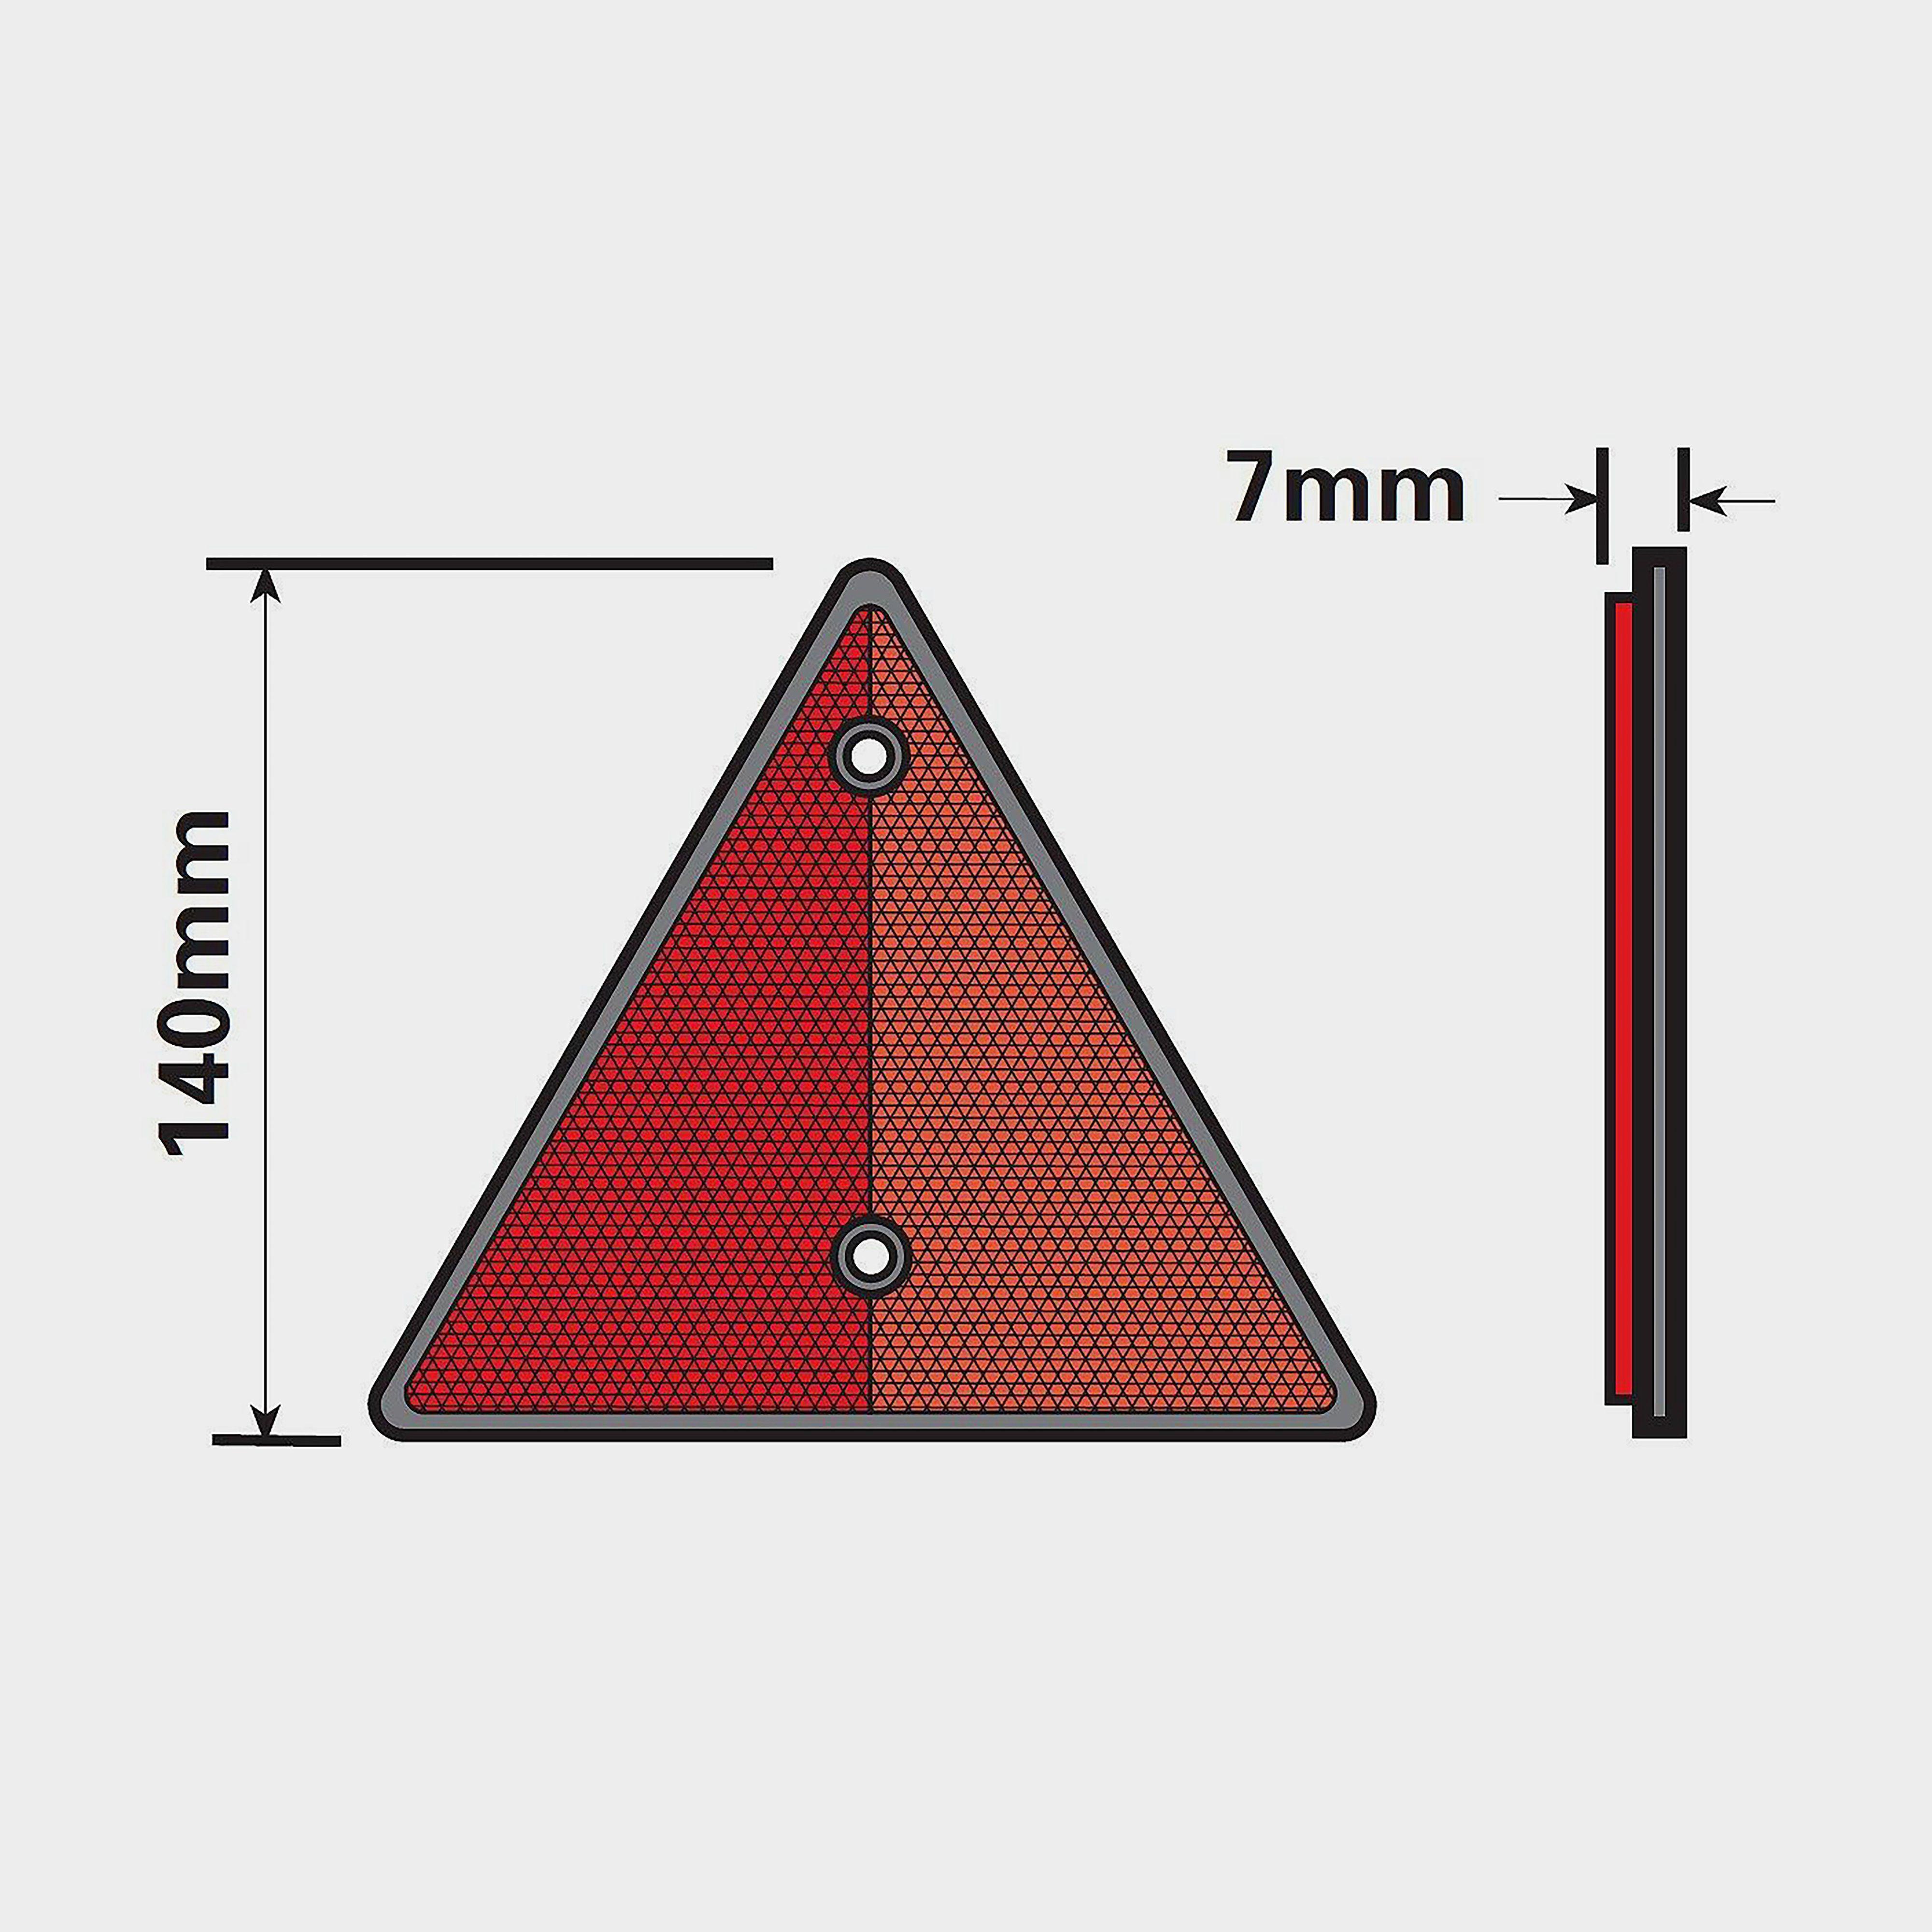 MAYPOLE Reflective Trailer Triangle 2 Pack